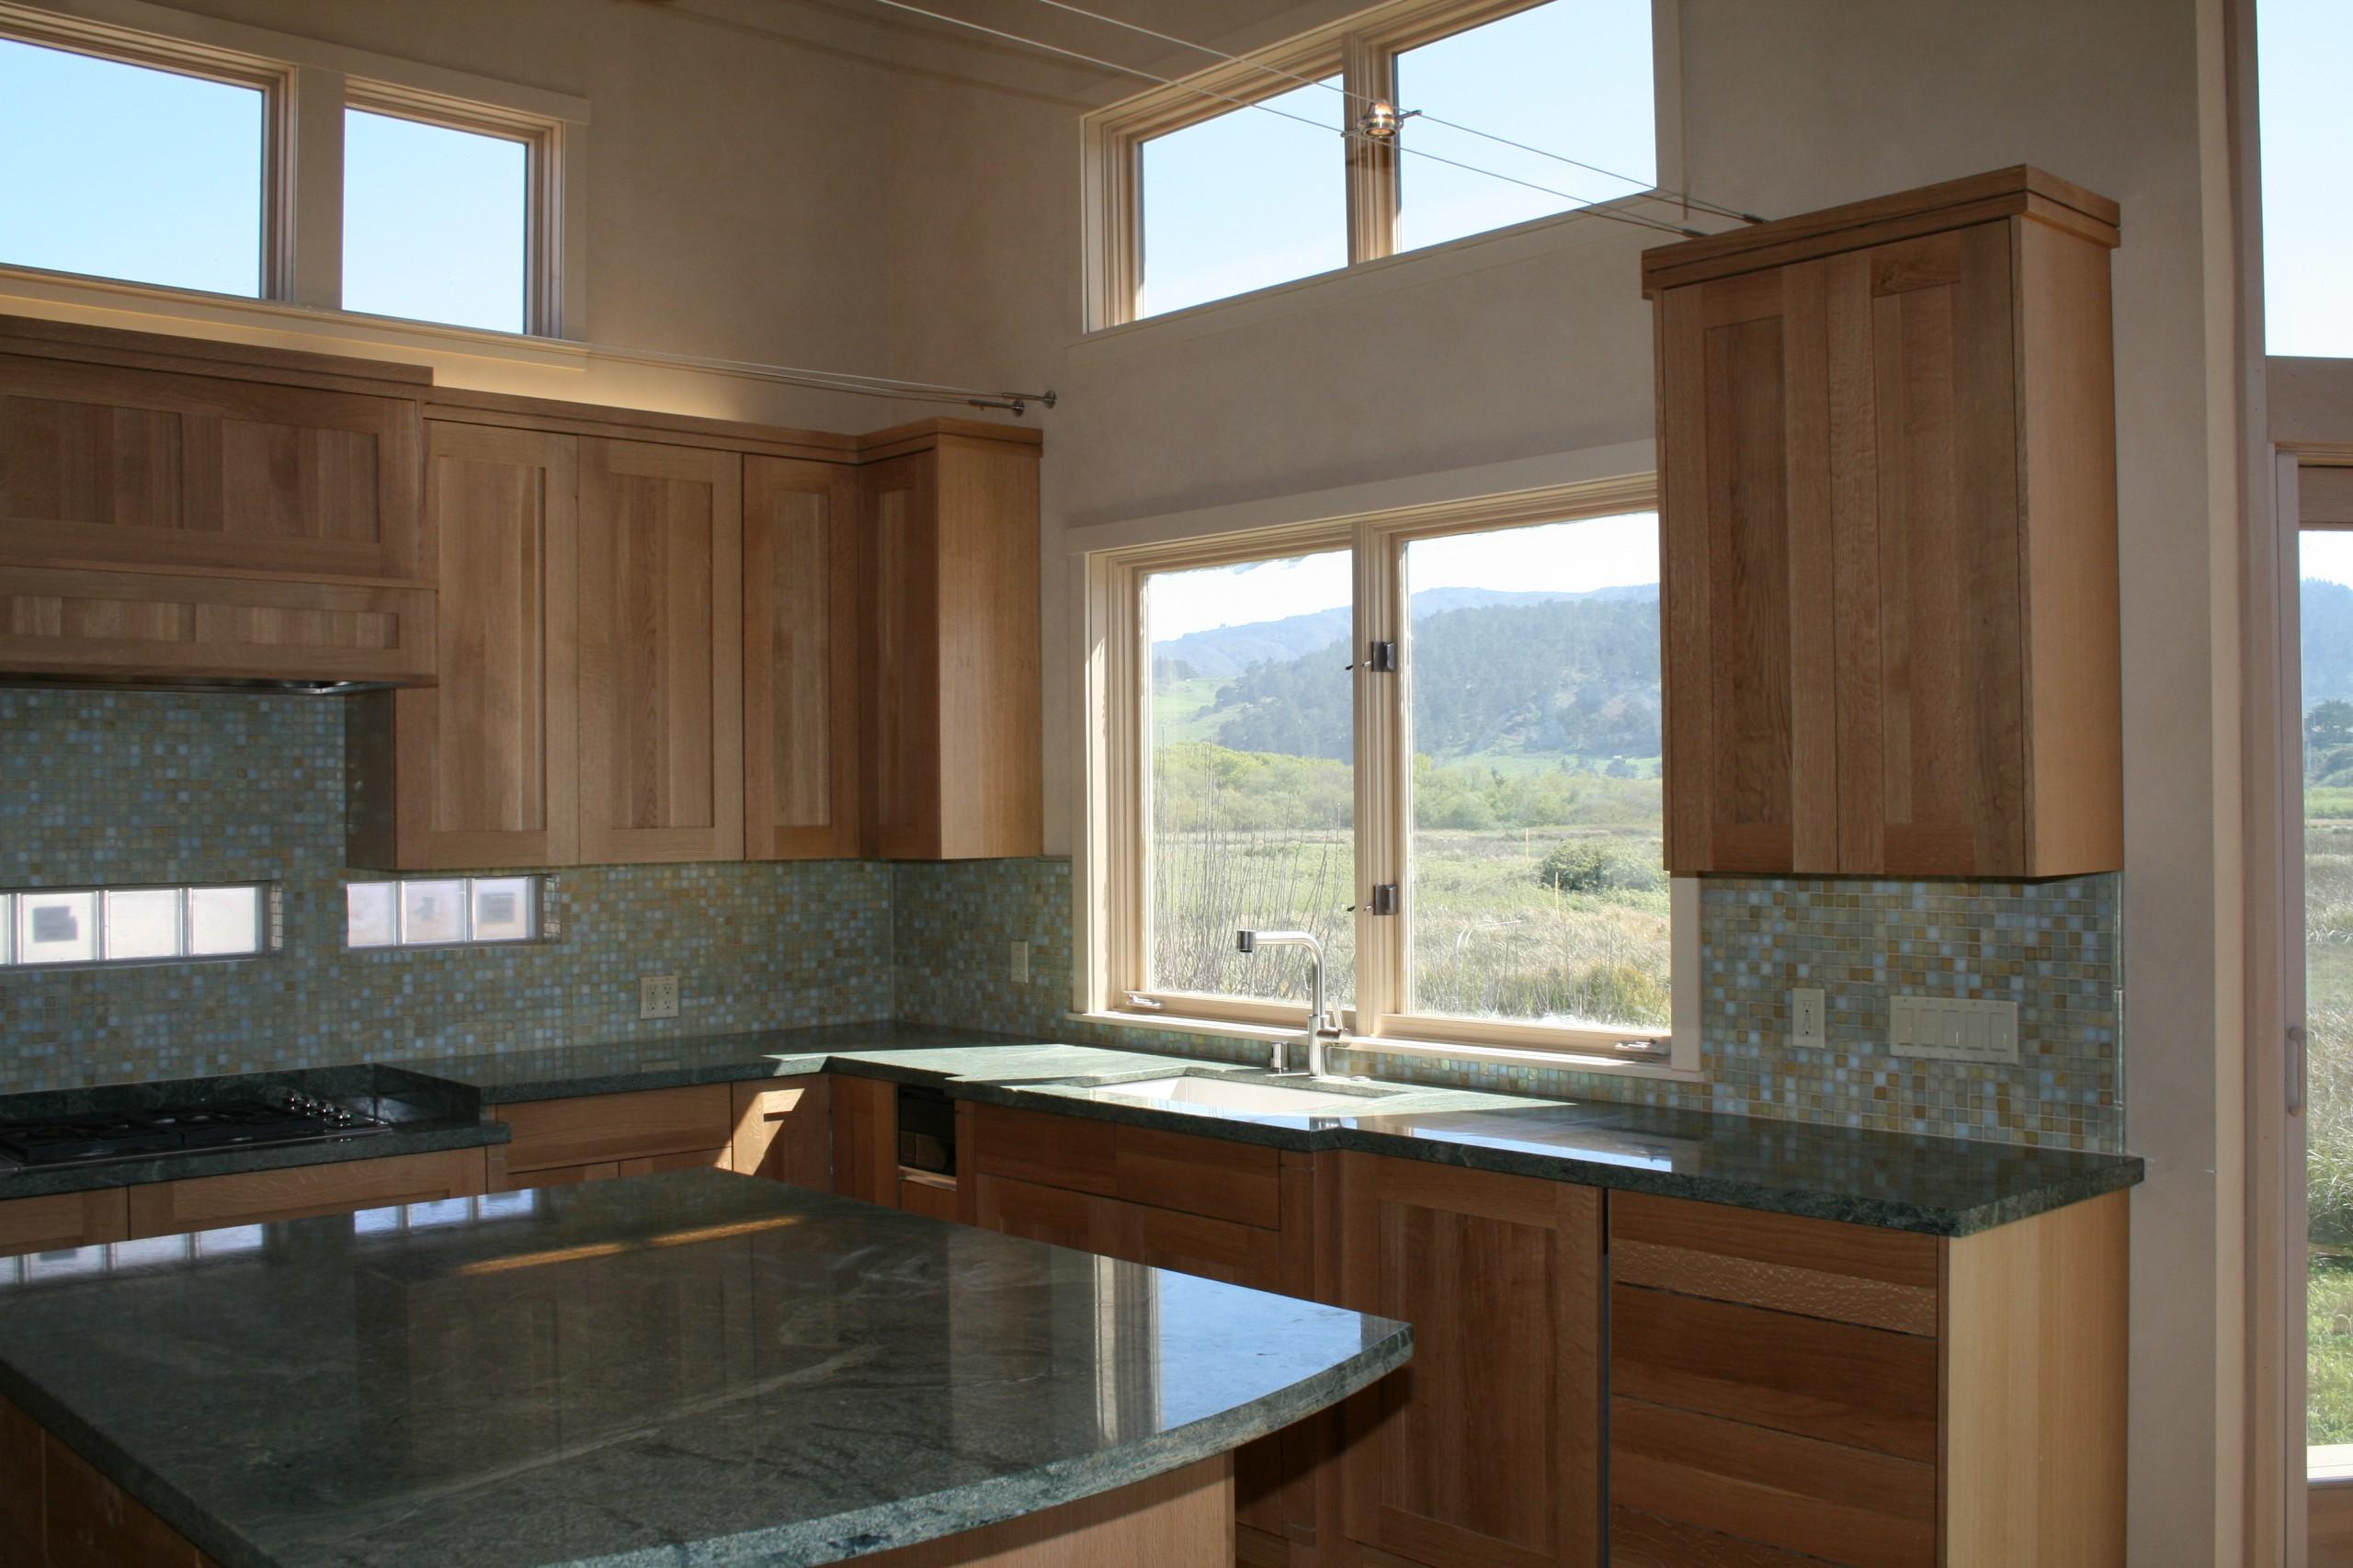 Kitchen-Bradbury-05